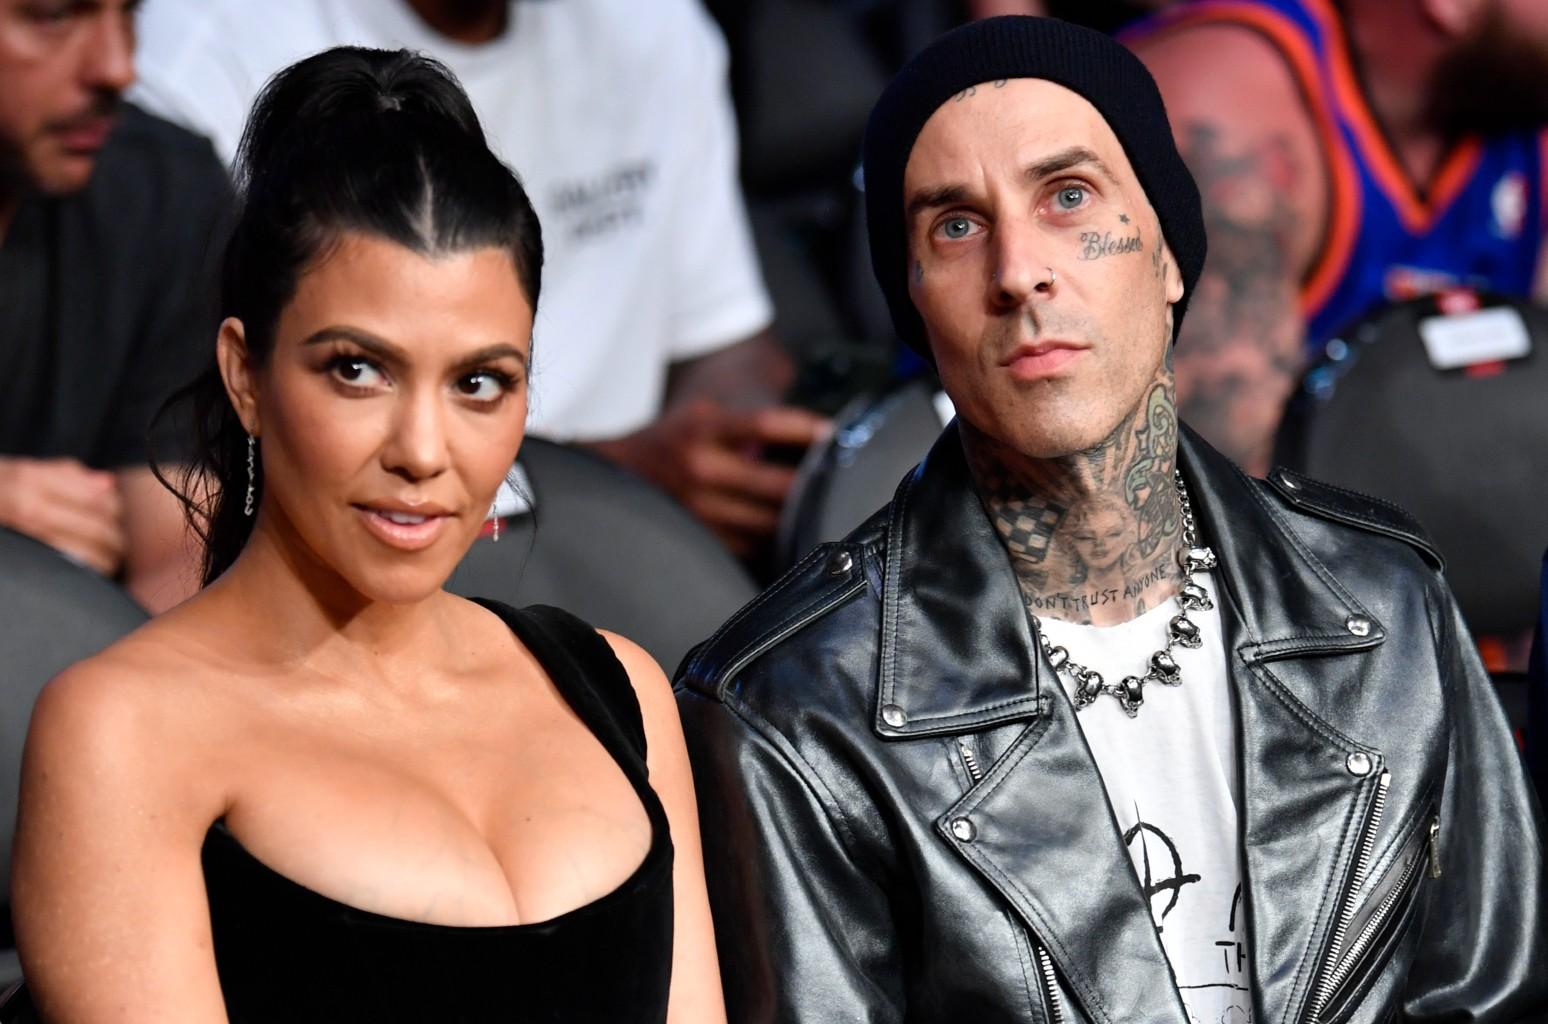 Travis Barker & Kourtney Kardashian Celebrate Halloween Early as Sid & Nancy: See Photos